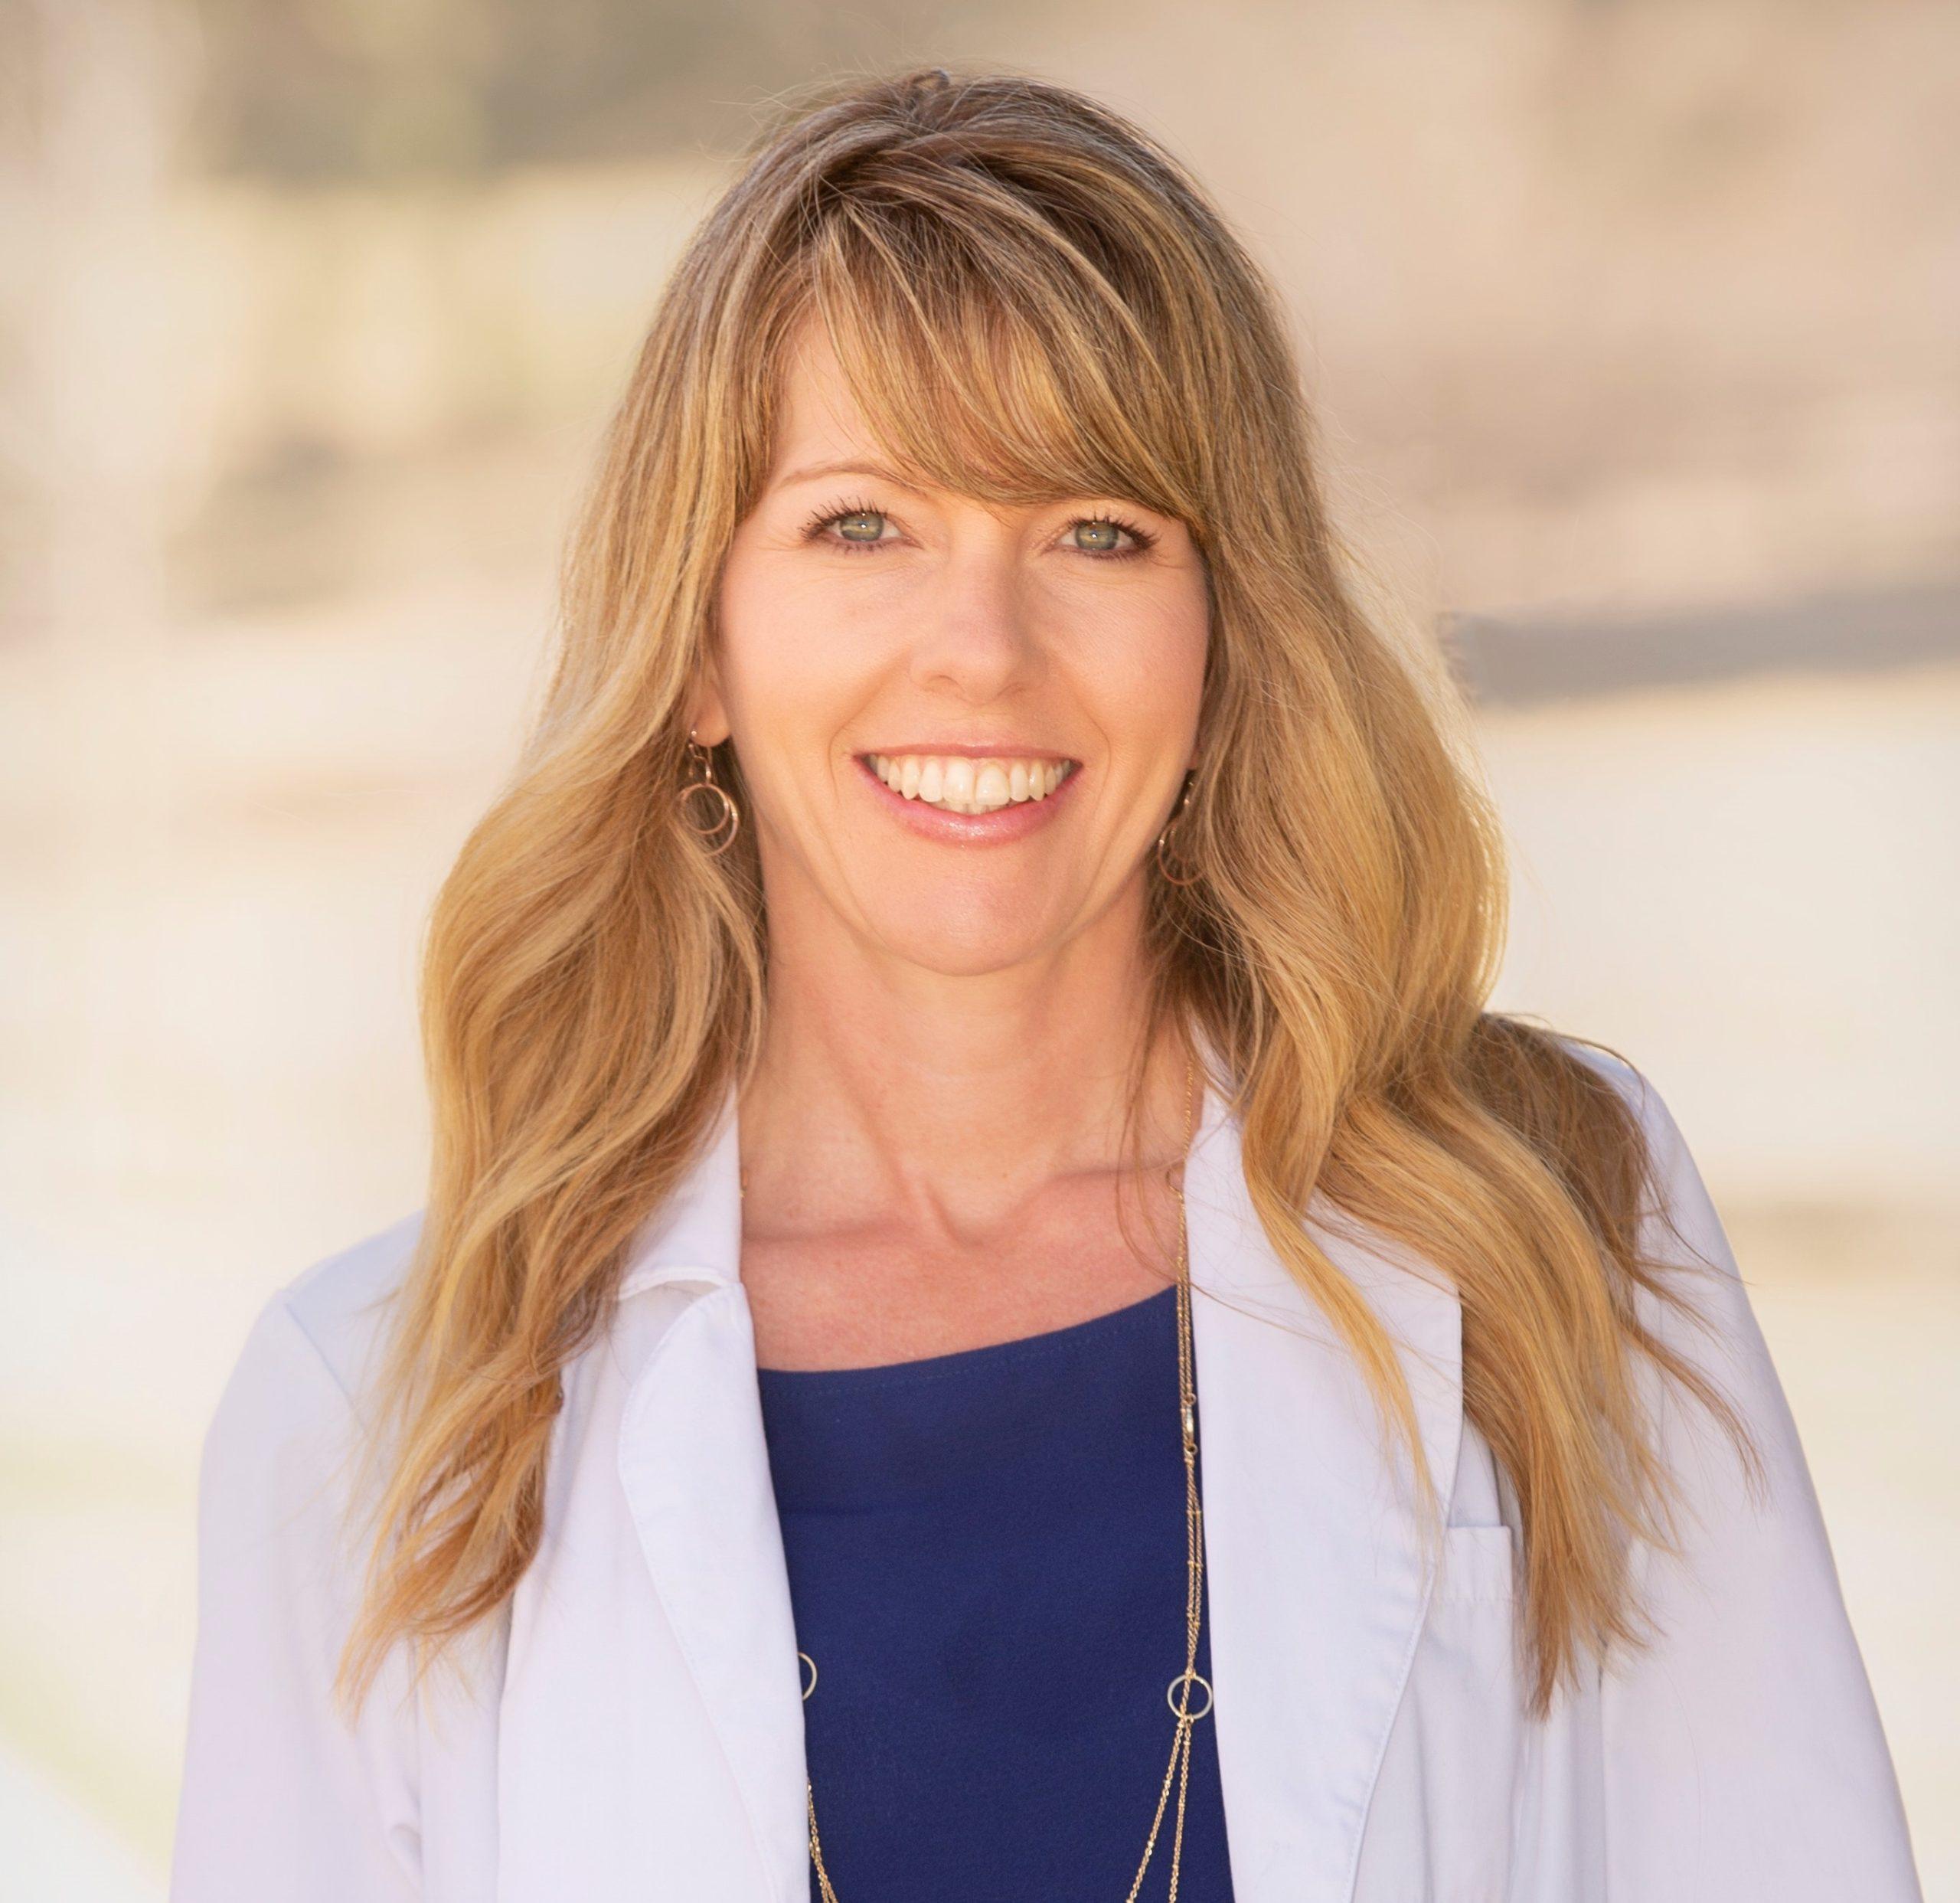 Marie Janson, DVM, MS, Diplomate ACVIM (Oncology)